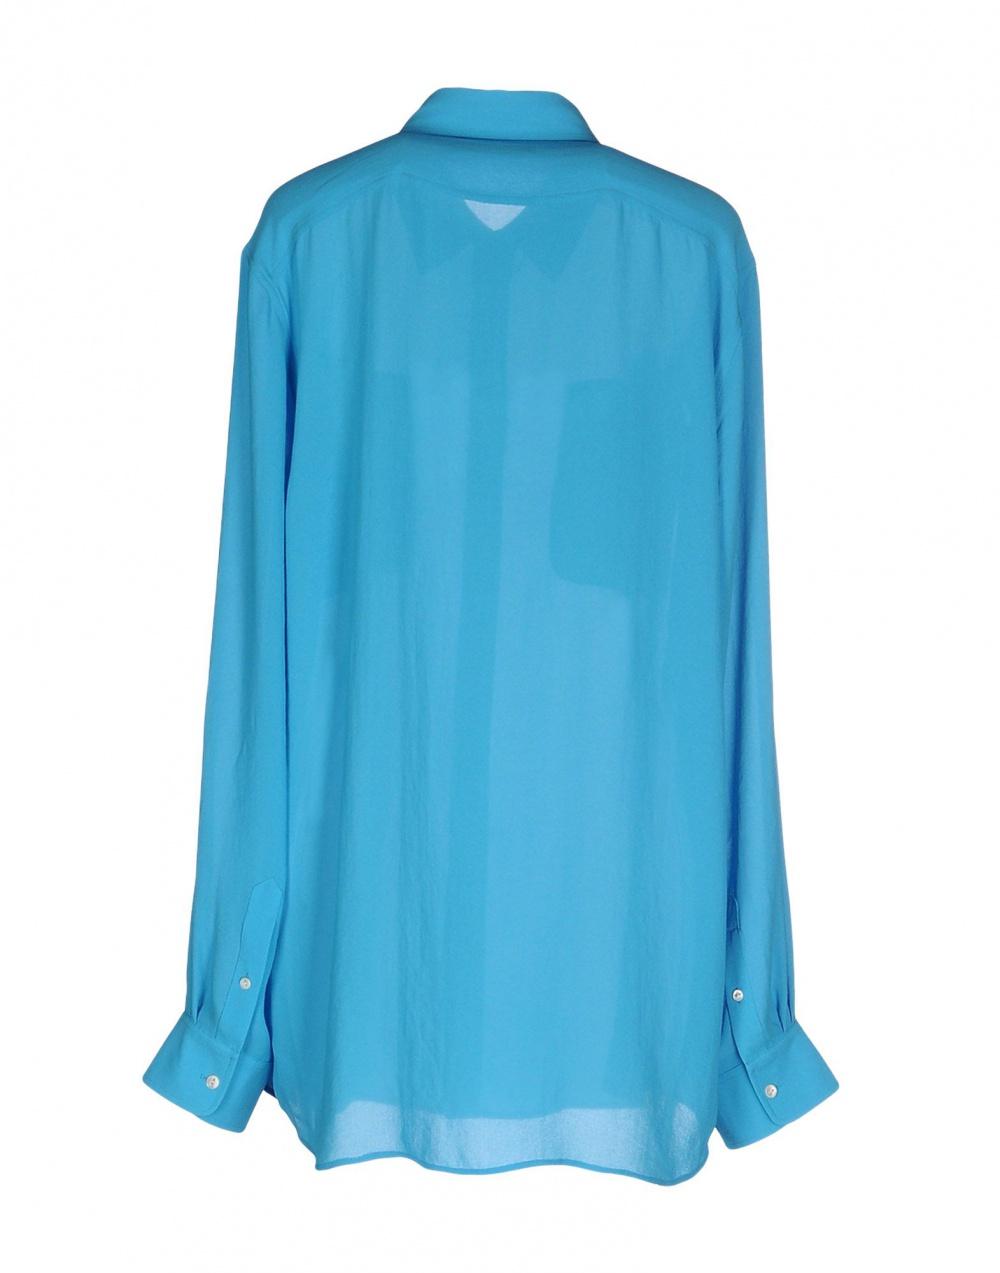 Женская рубашка POLO RALPH LAUREN  размер L